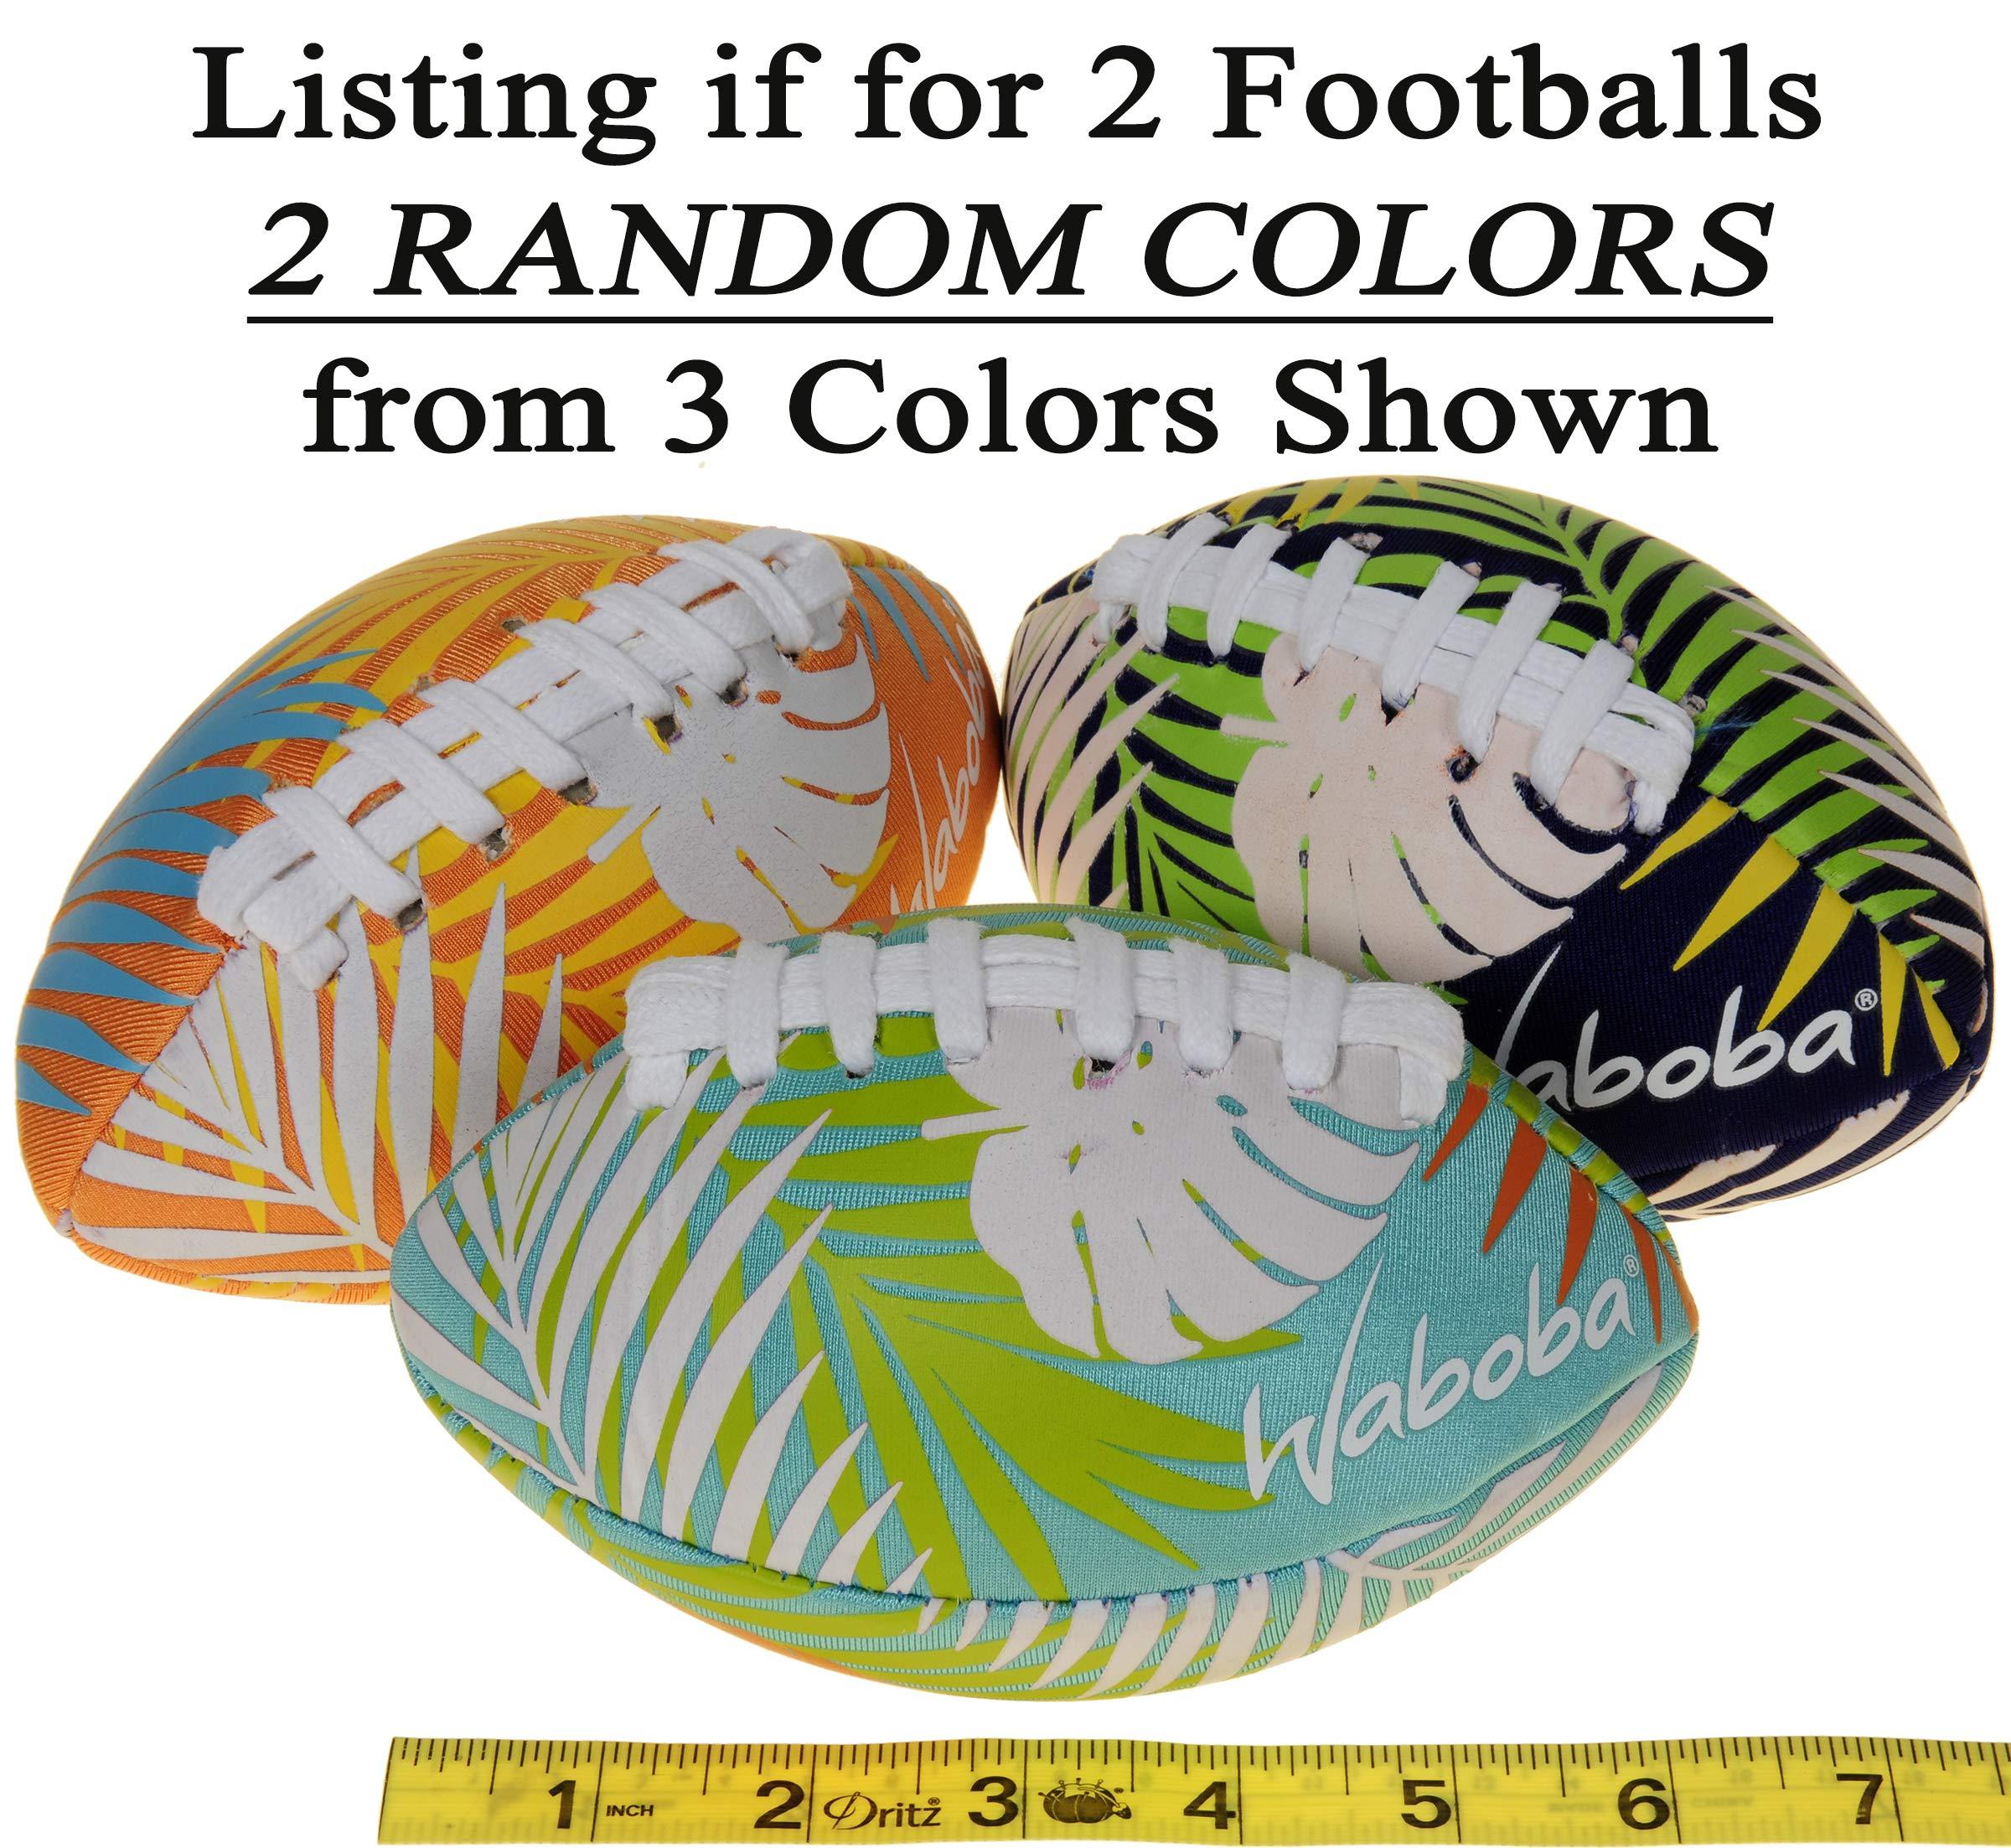 Waboba Color Changing Water Football 6'' // Bundle of 2 Footballs (Random Colors) // Bonus Blue Nylon Mesh Carry Bag// Bundled Items by Waboba (Image #4)